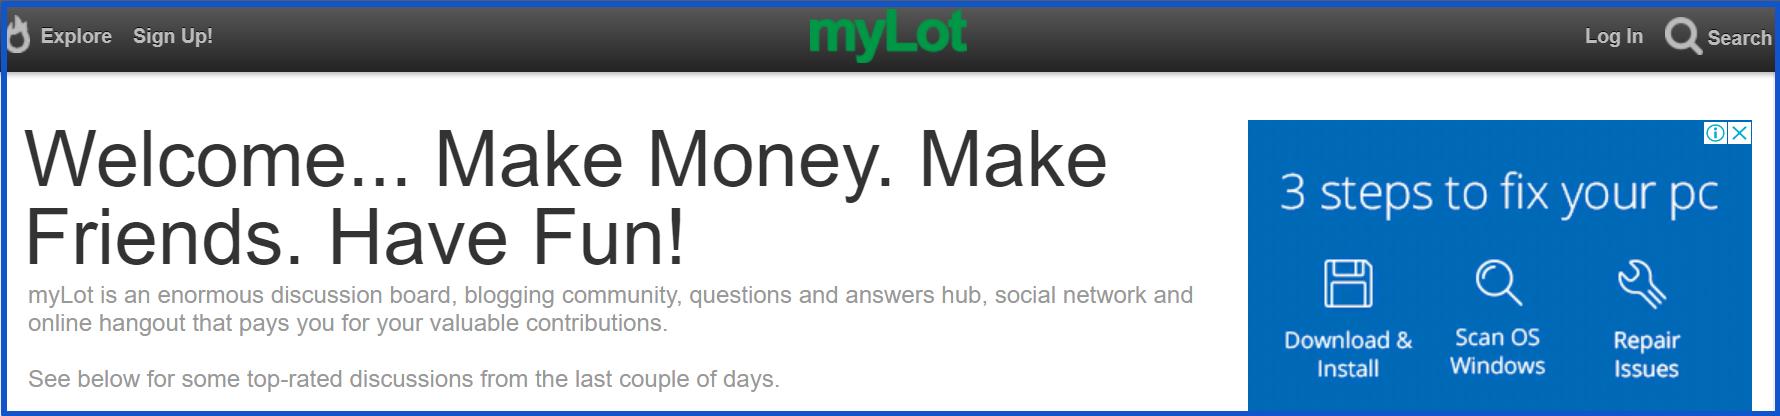 myLot_homepage_